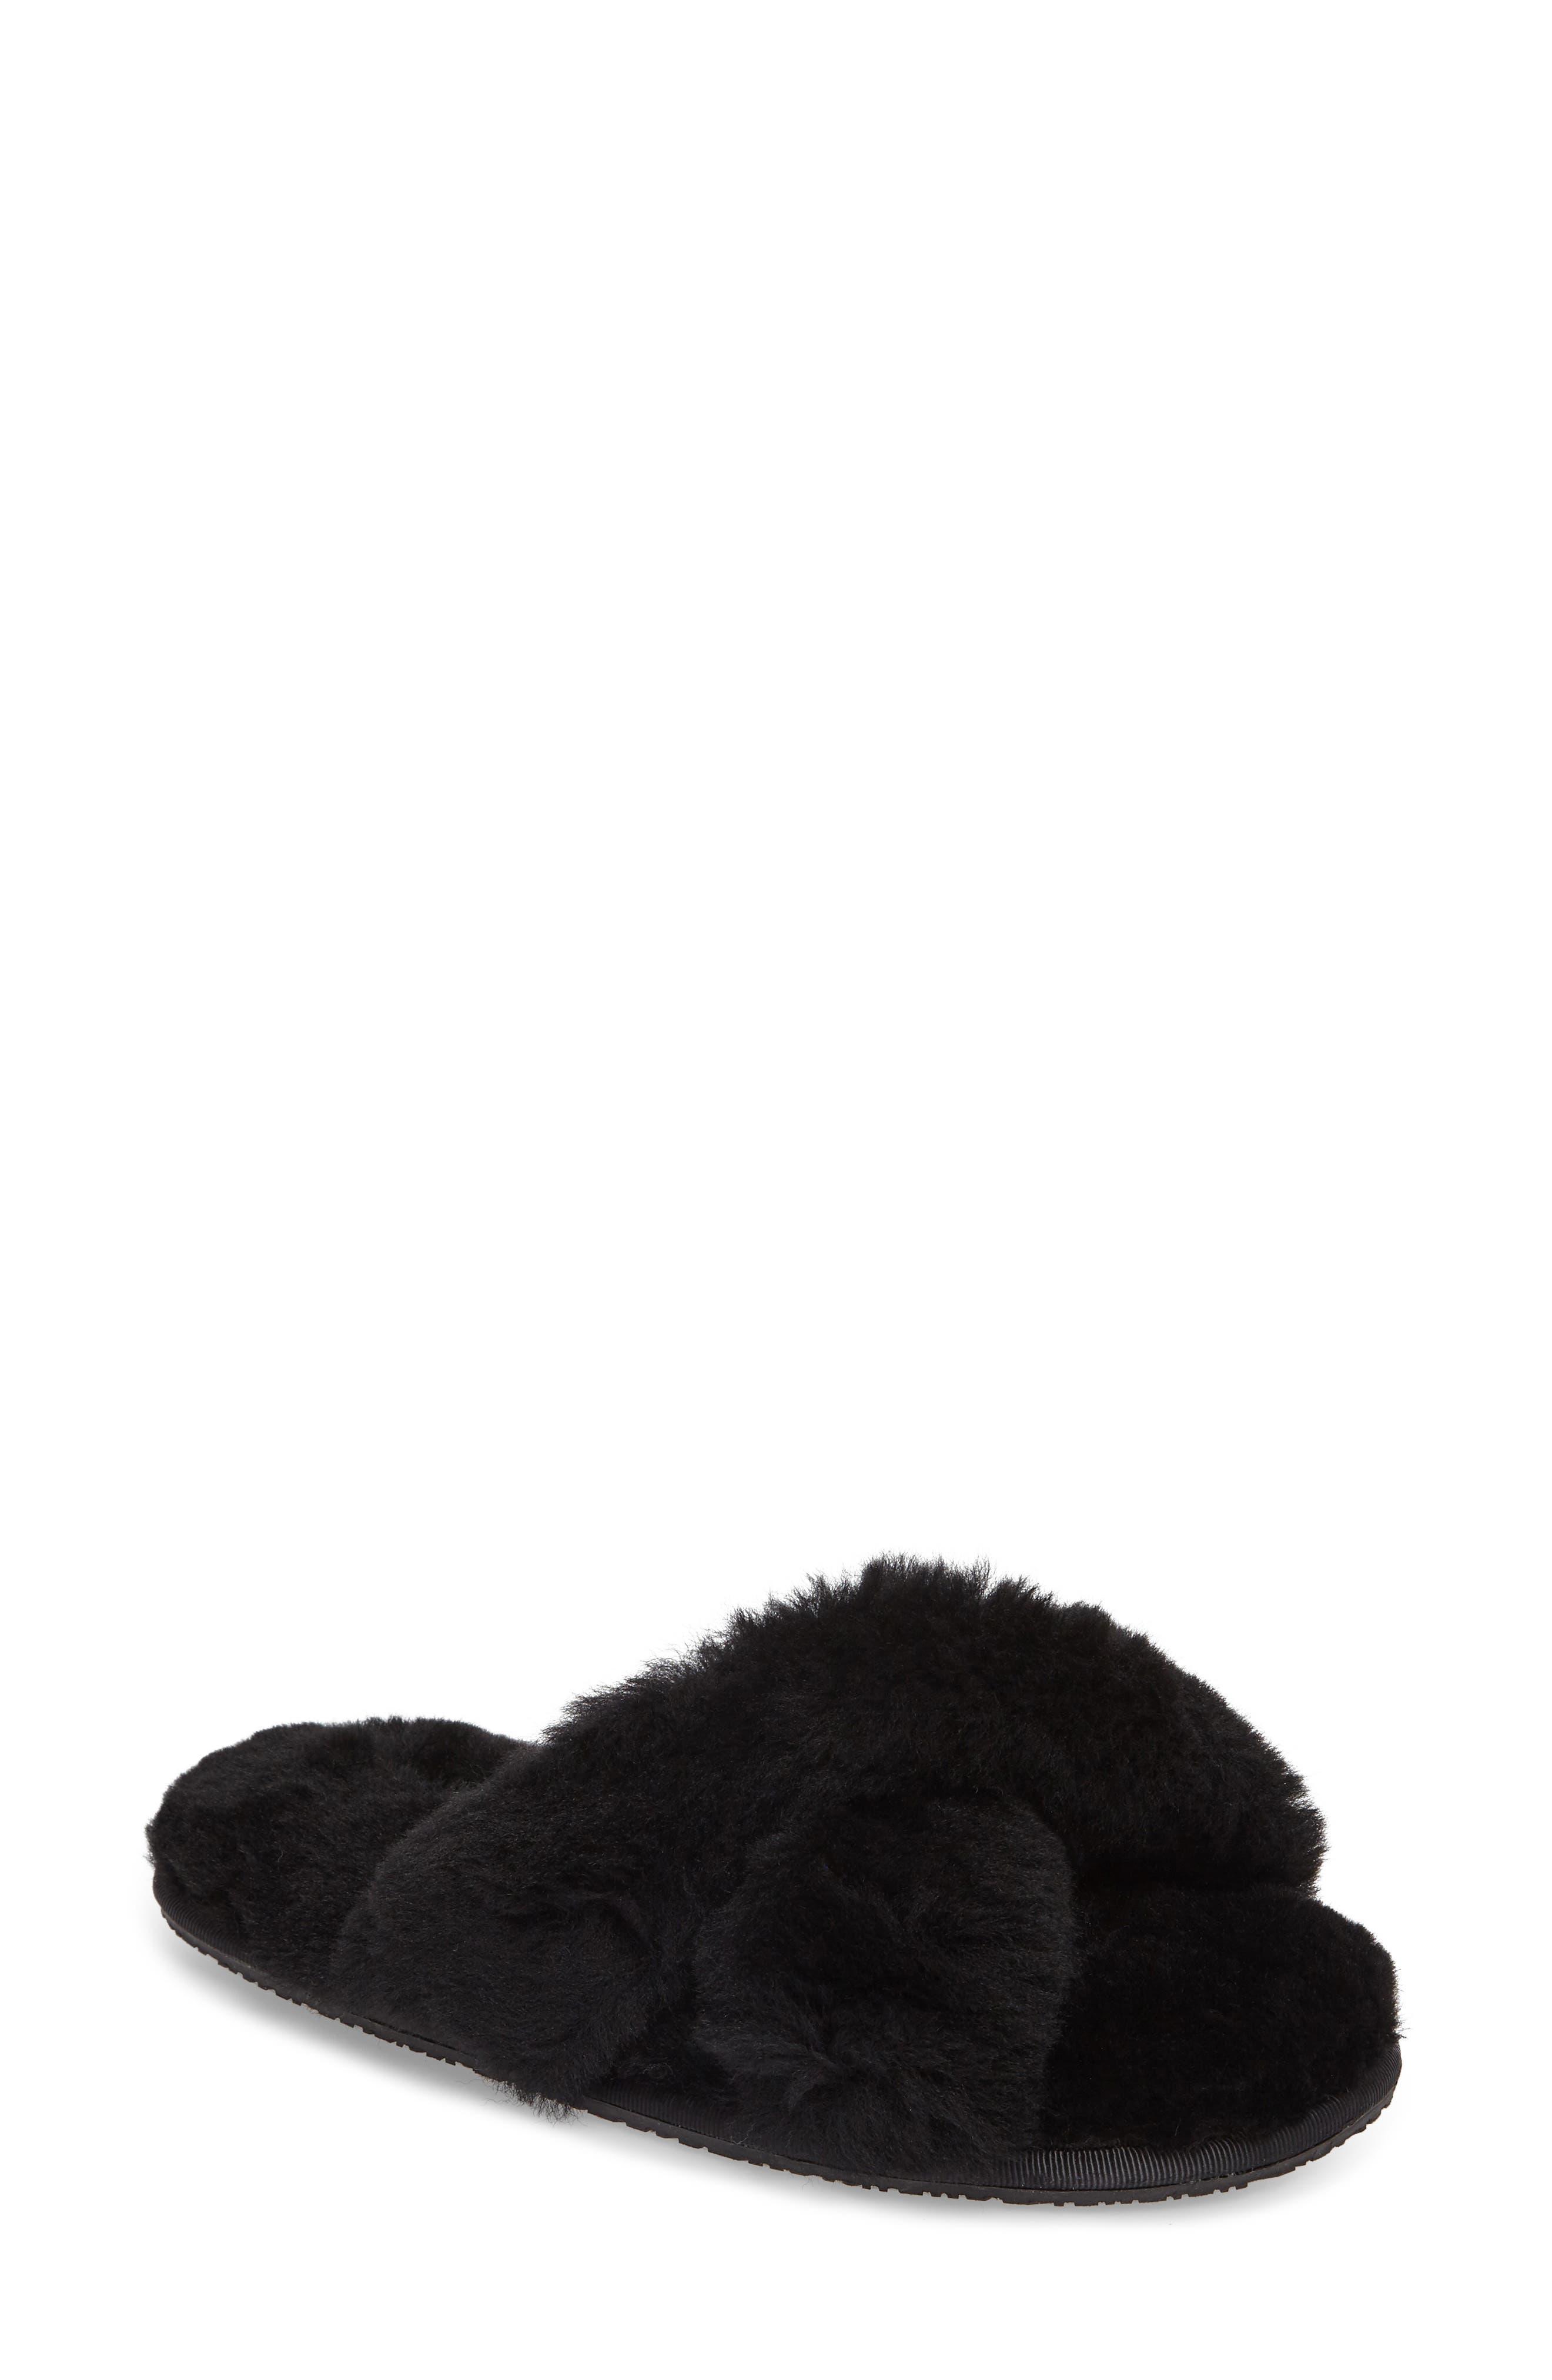 Mt. Hood Genuine Shearling Slipper,                             Main thumbnail 1, color,                             BLACK